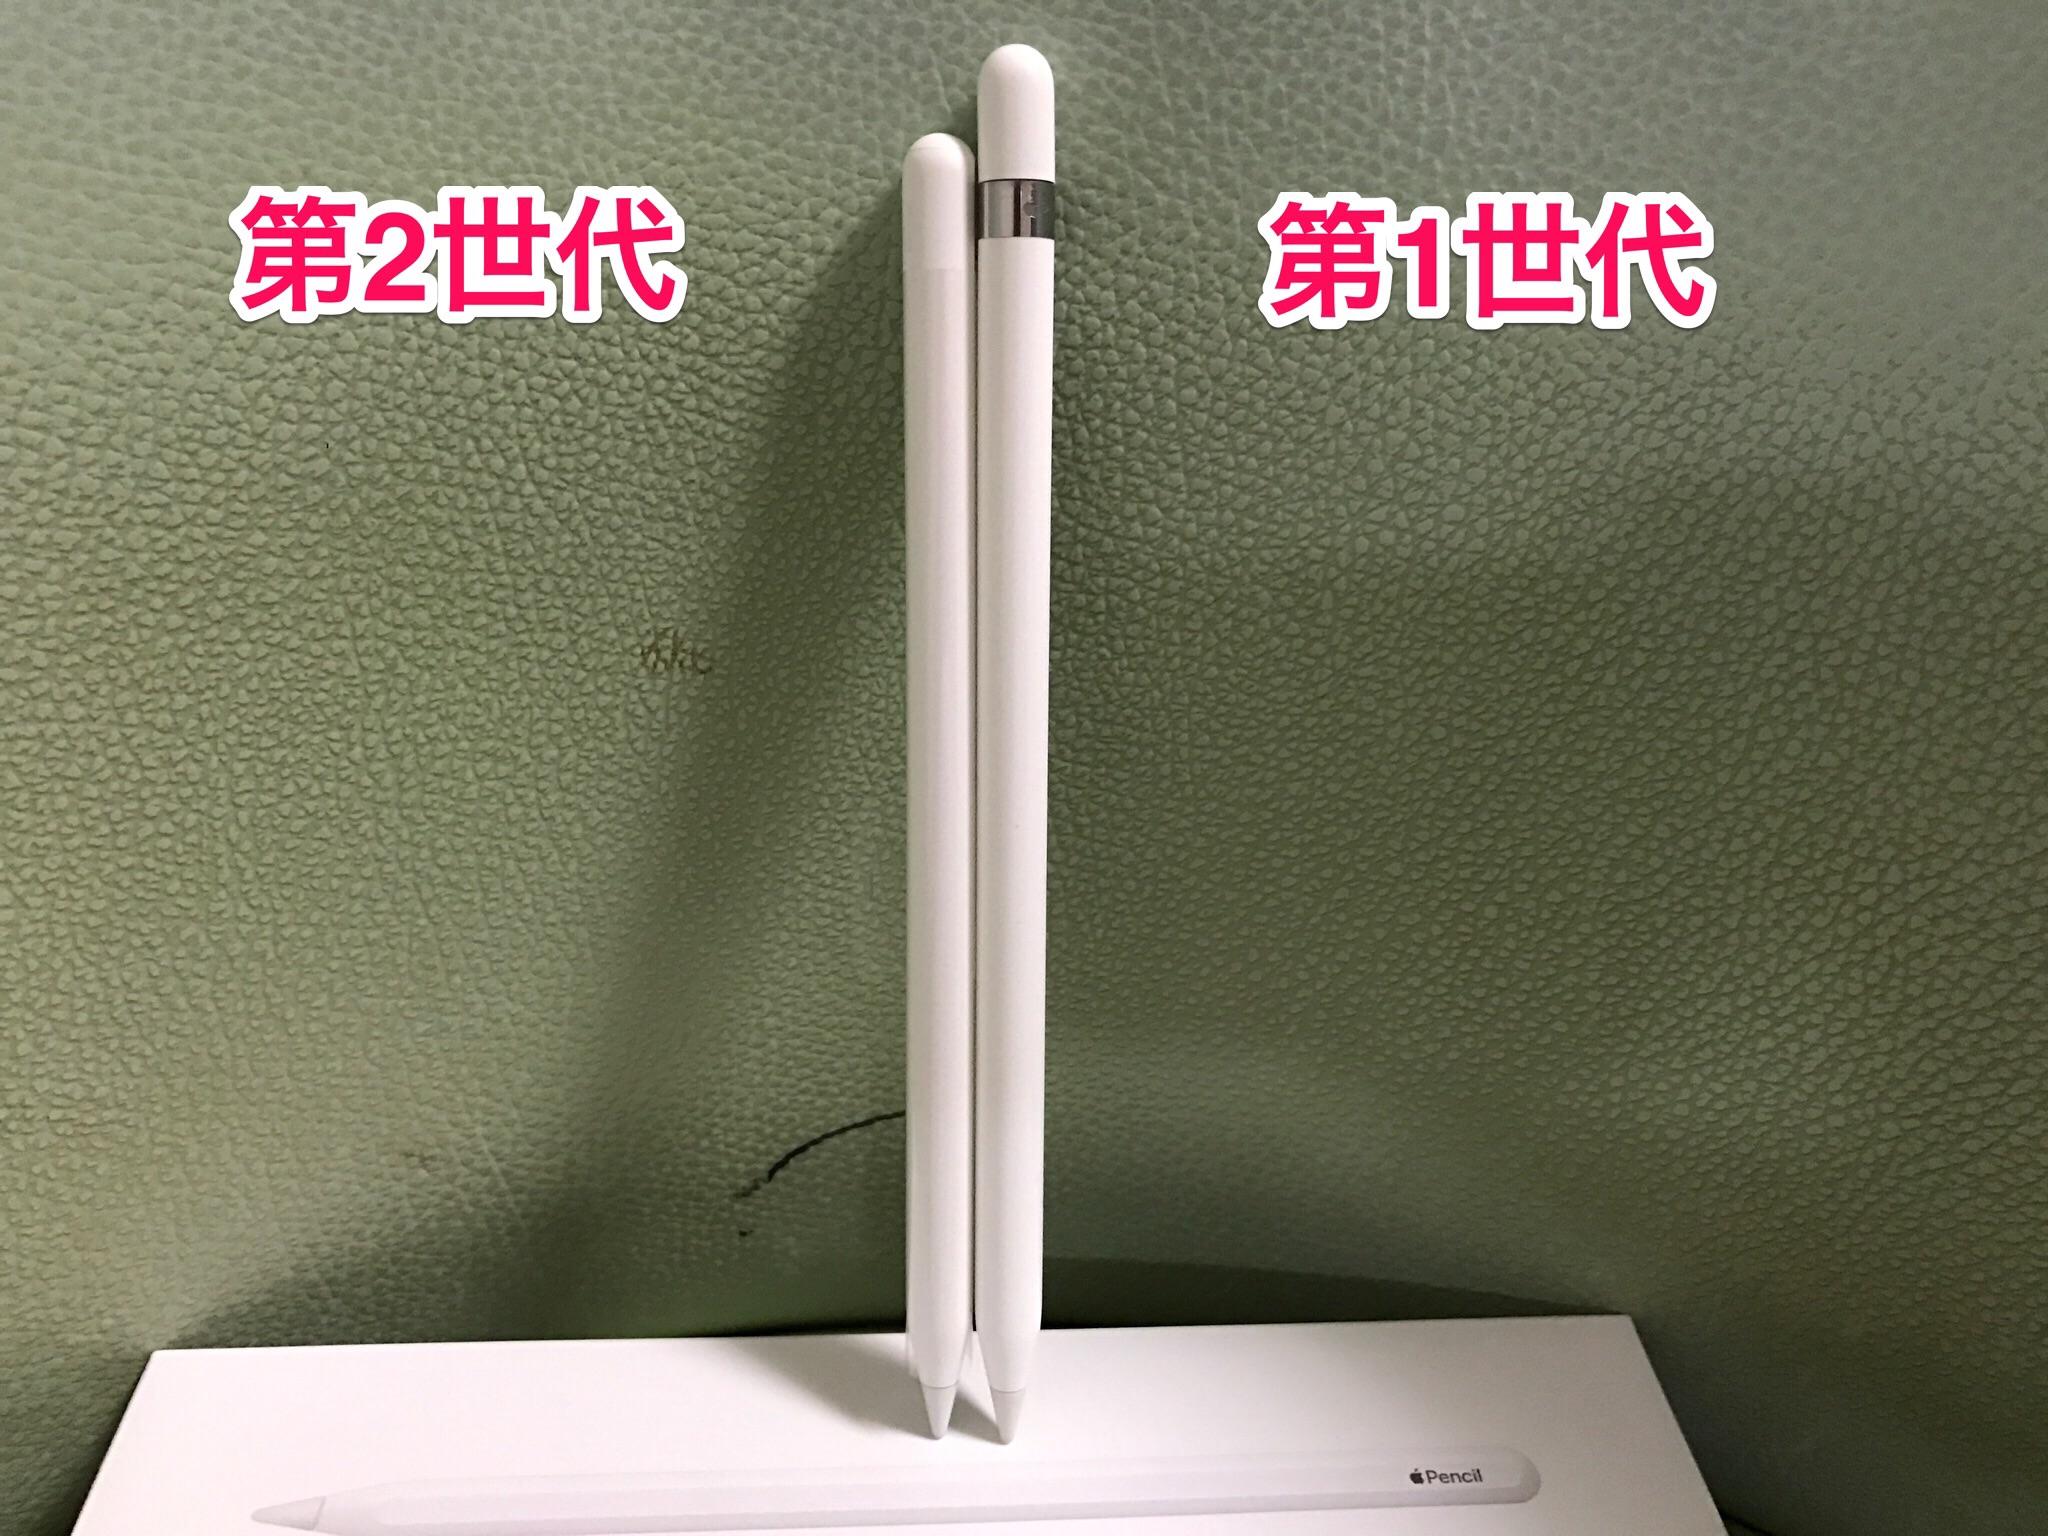 第 apple 一 世代 pencil